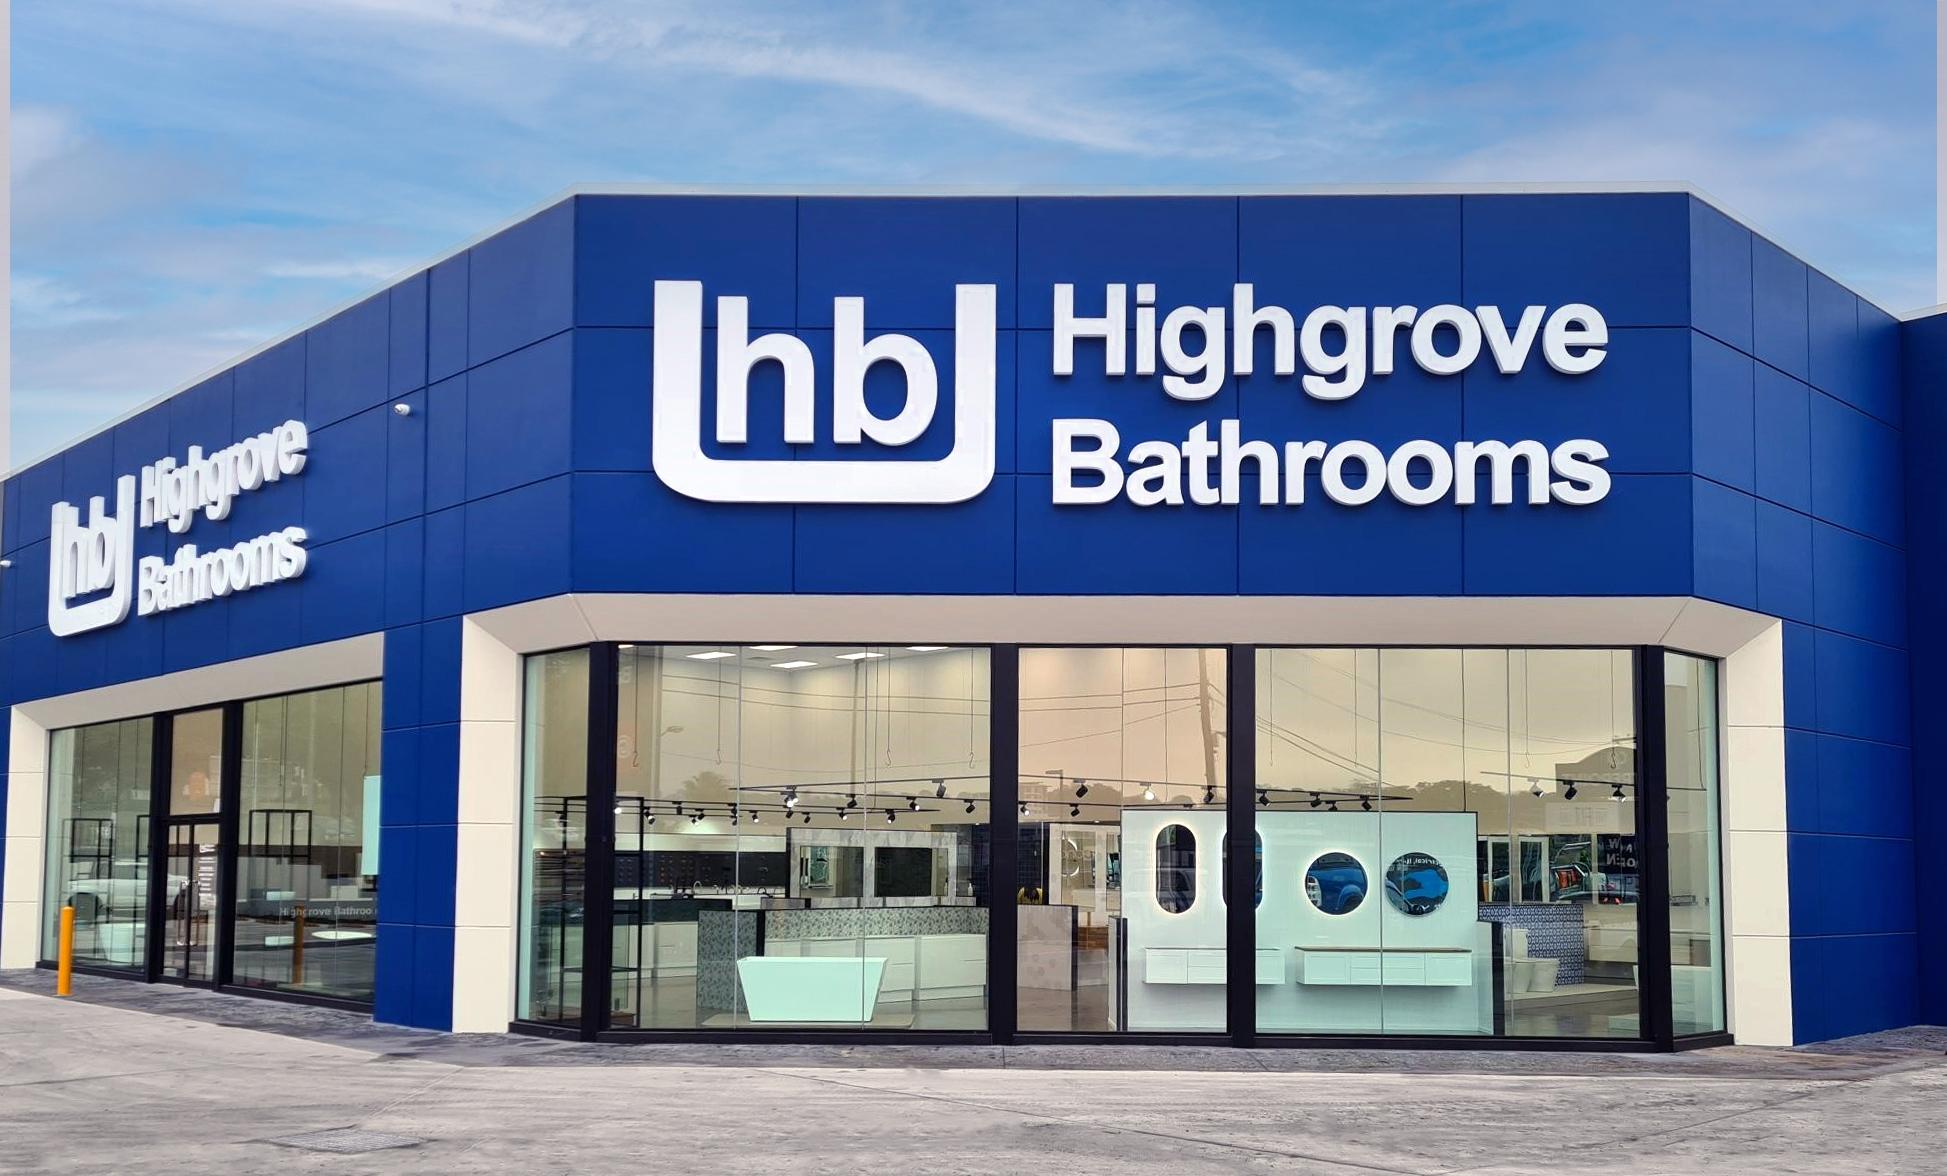 Highgrove Bathrooms - Toowoomba